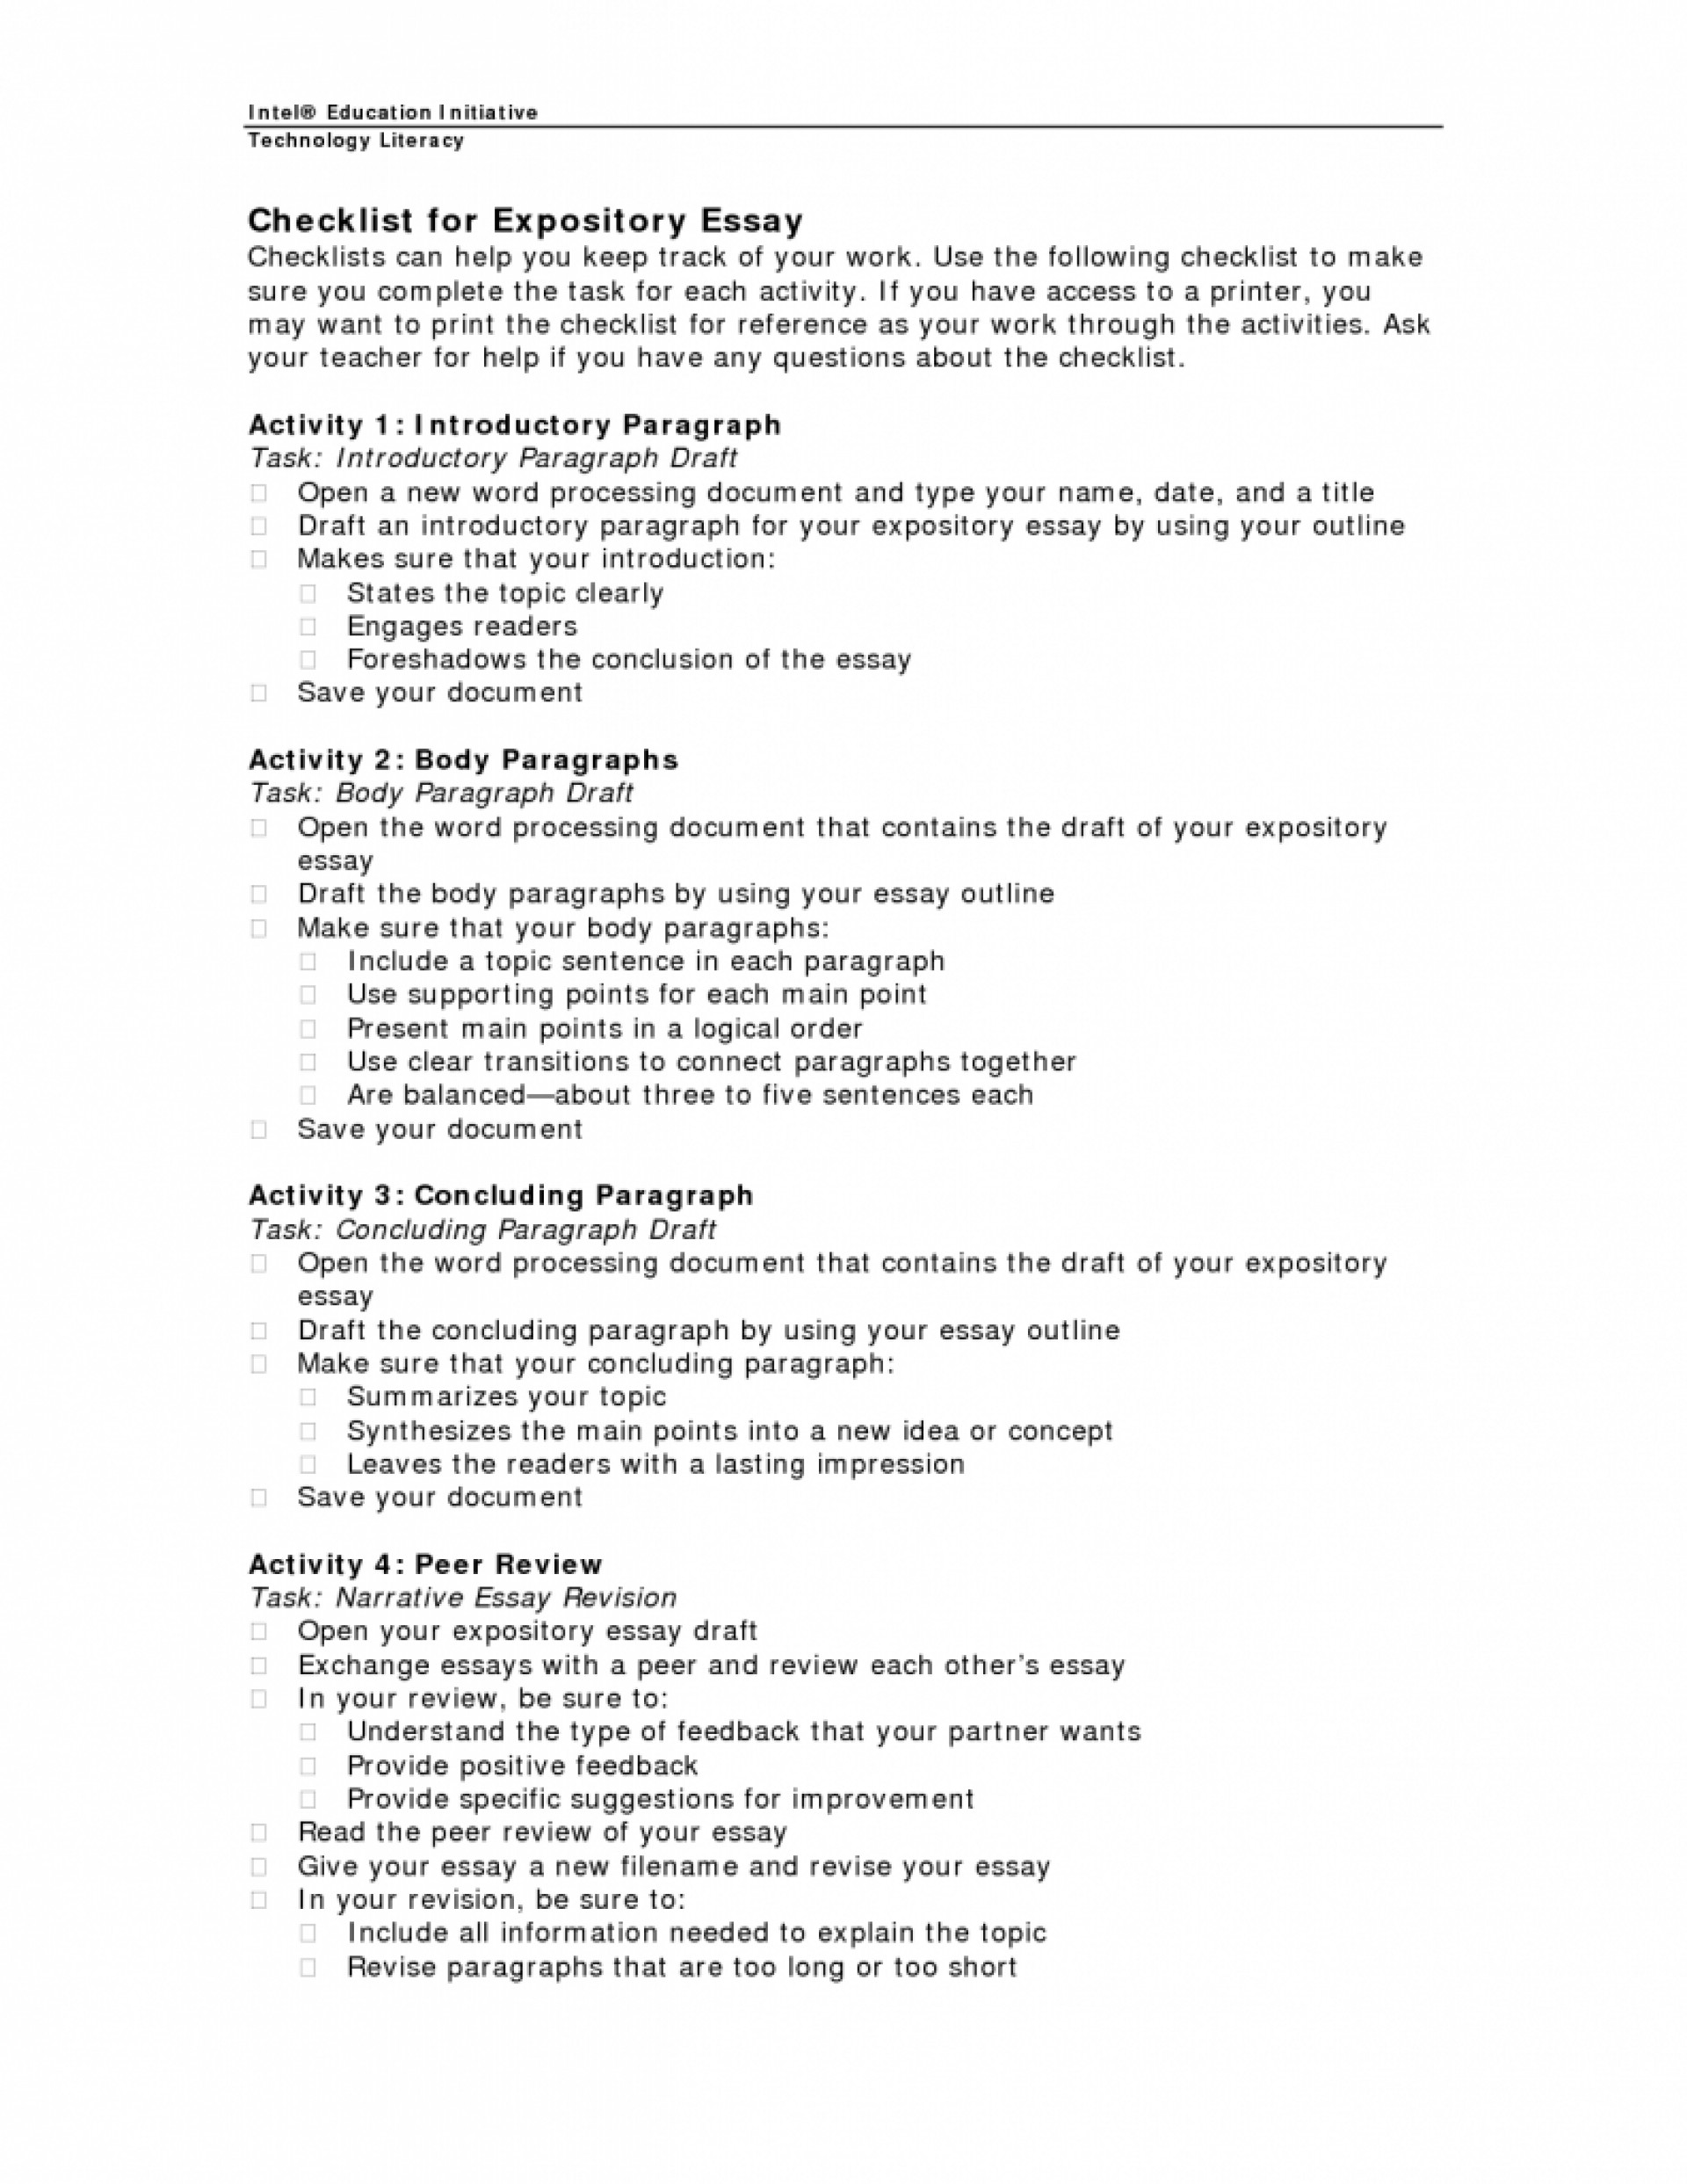 016 Expository Essay Checklist 791x1024 Example Outline Of Sensational An Argumentative Sample Co Education Pdf 1920